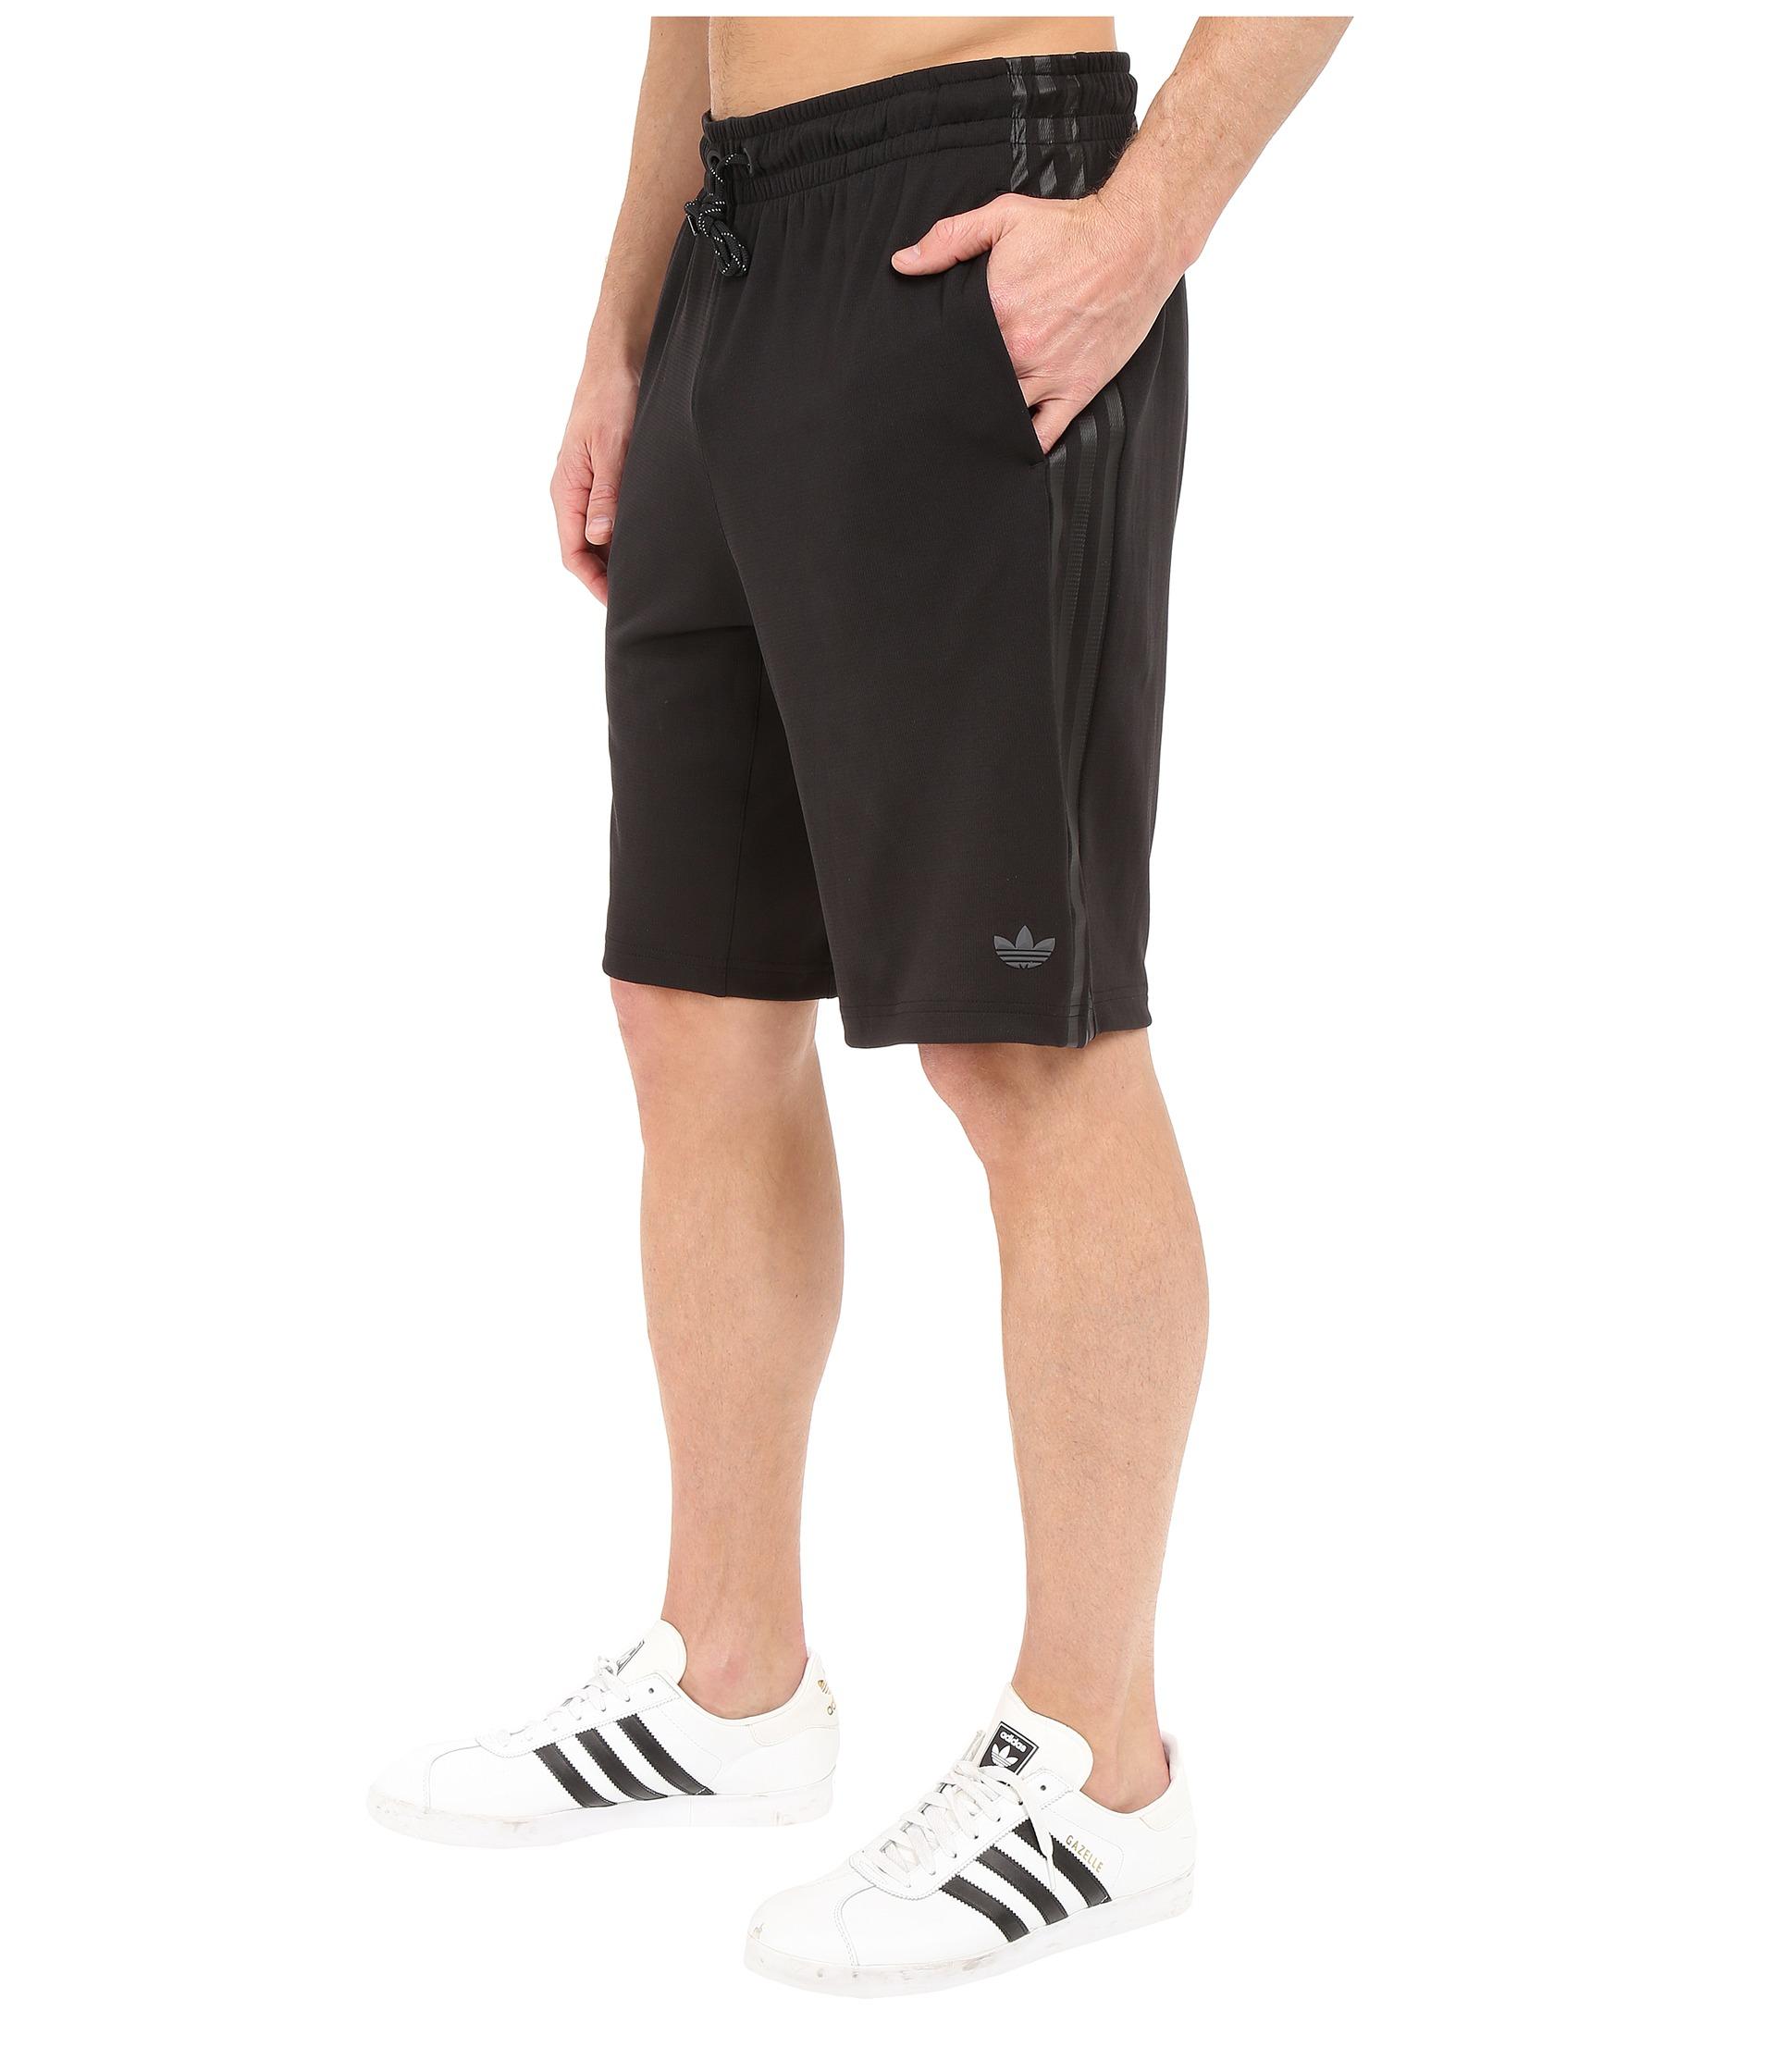 For Sport Men Black Adidas Shorts Luxe Originals 3 Stripes fg6b7YyvI